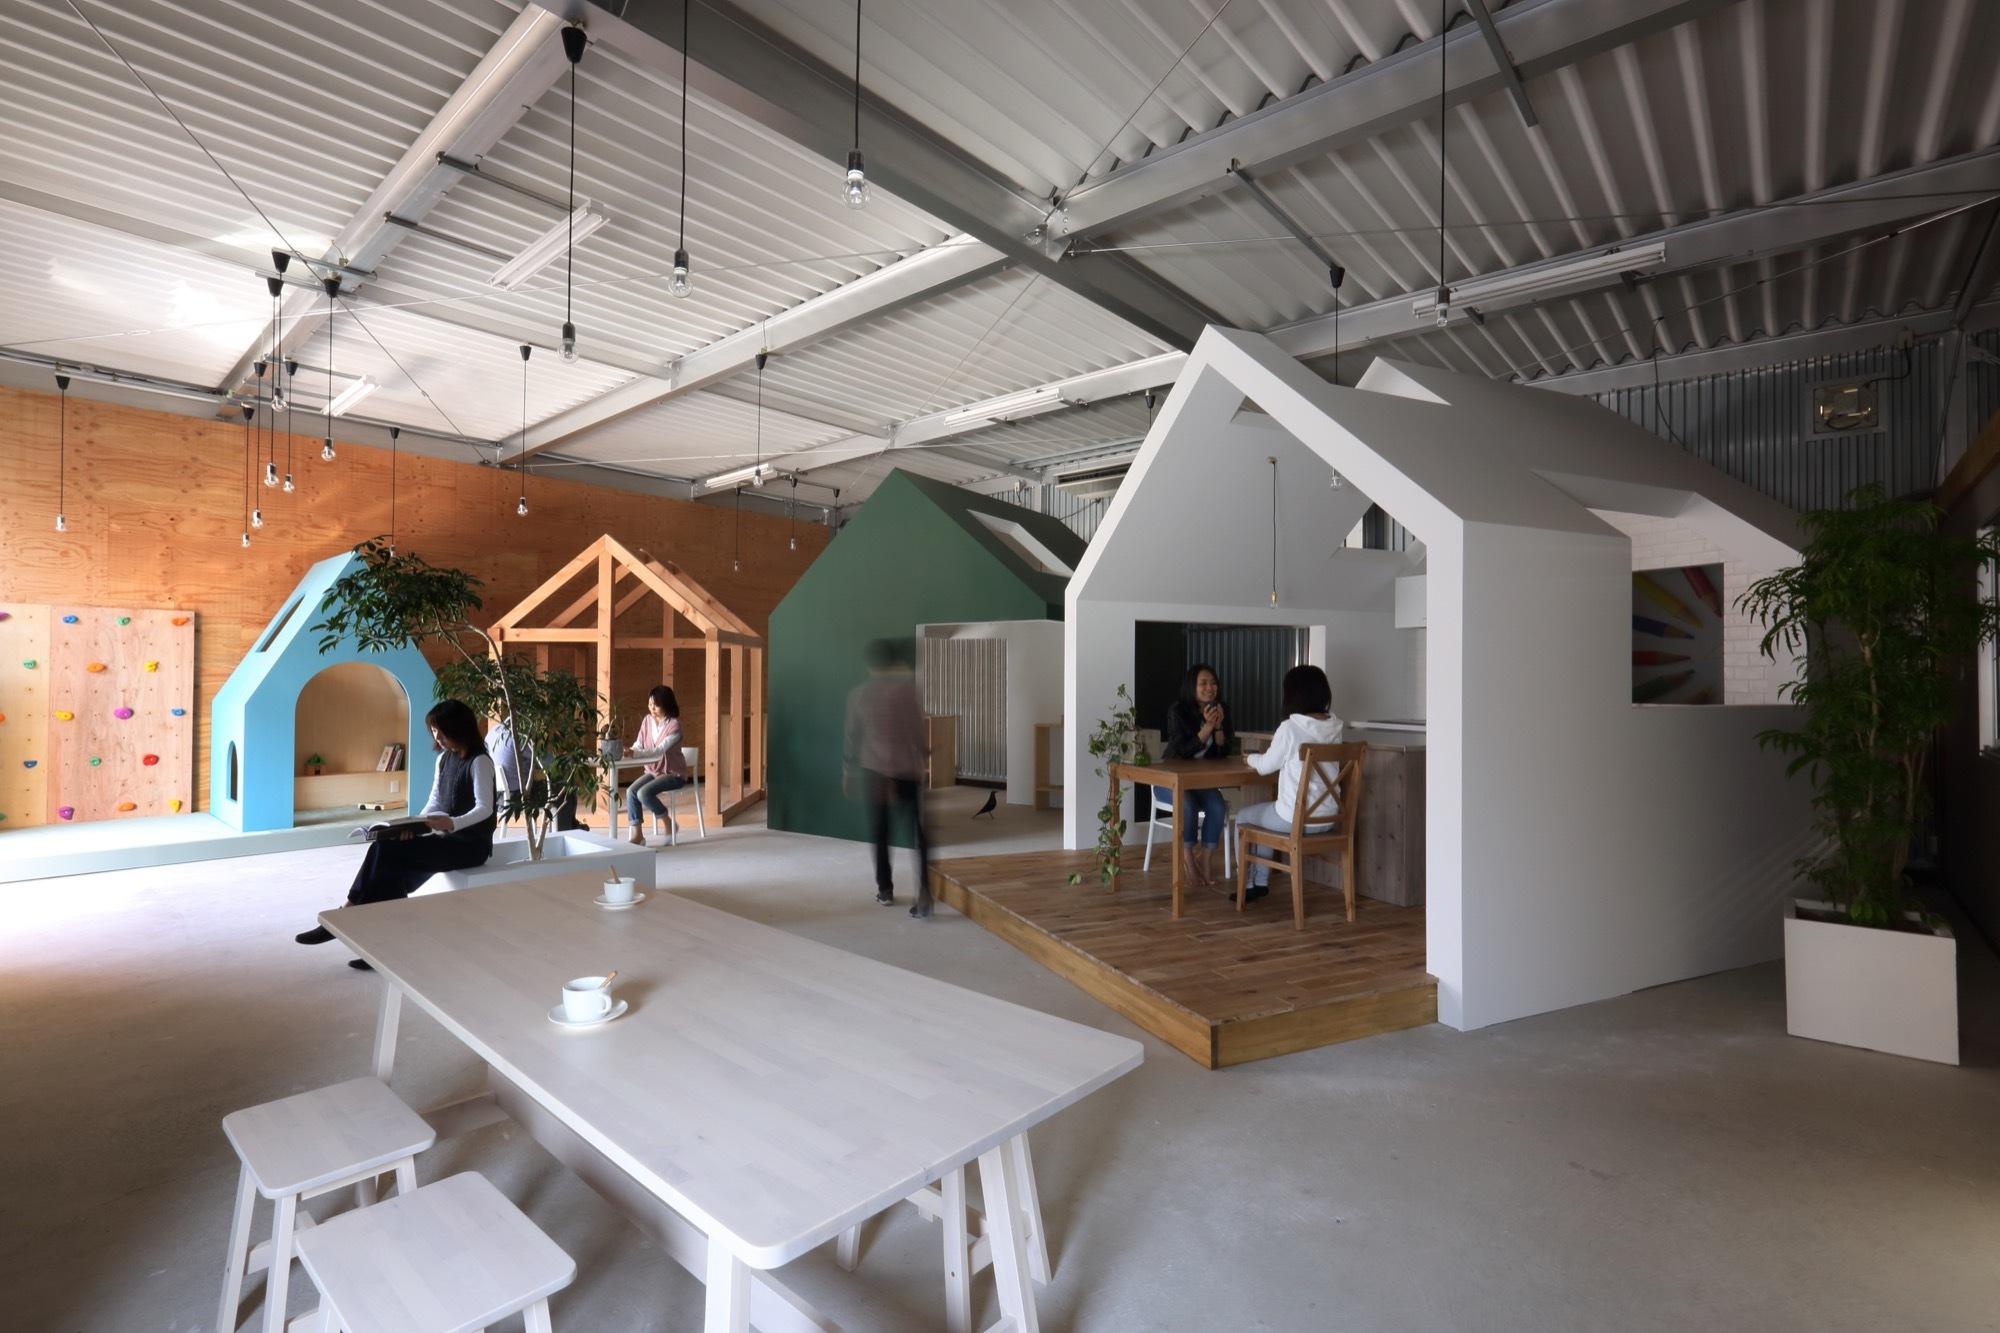 Kinder Garden: Omihihachiman-Workspace / ALTS Design Office